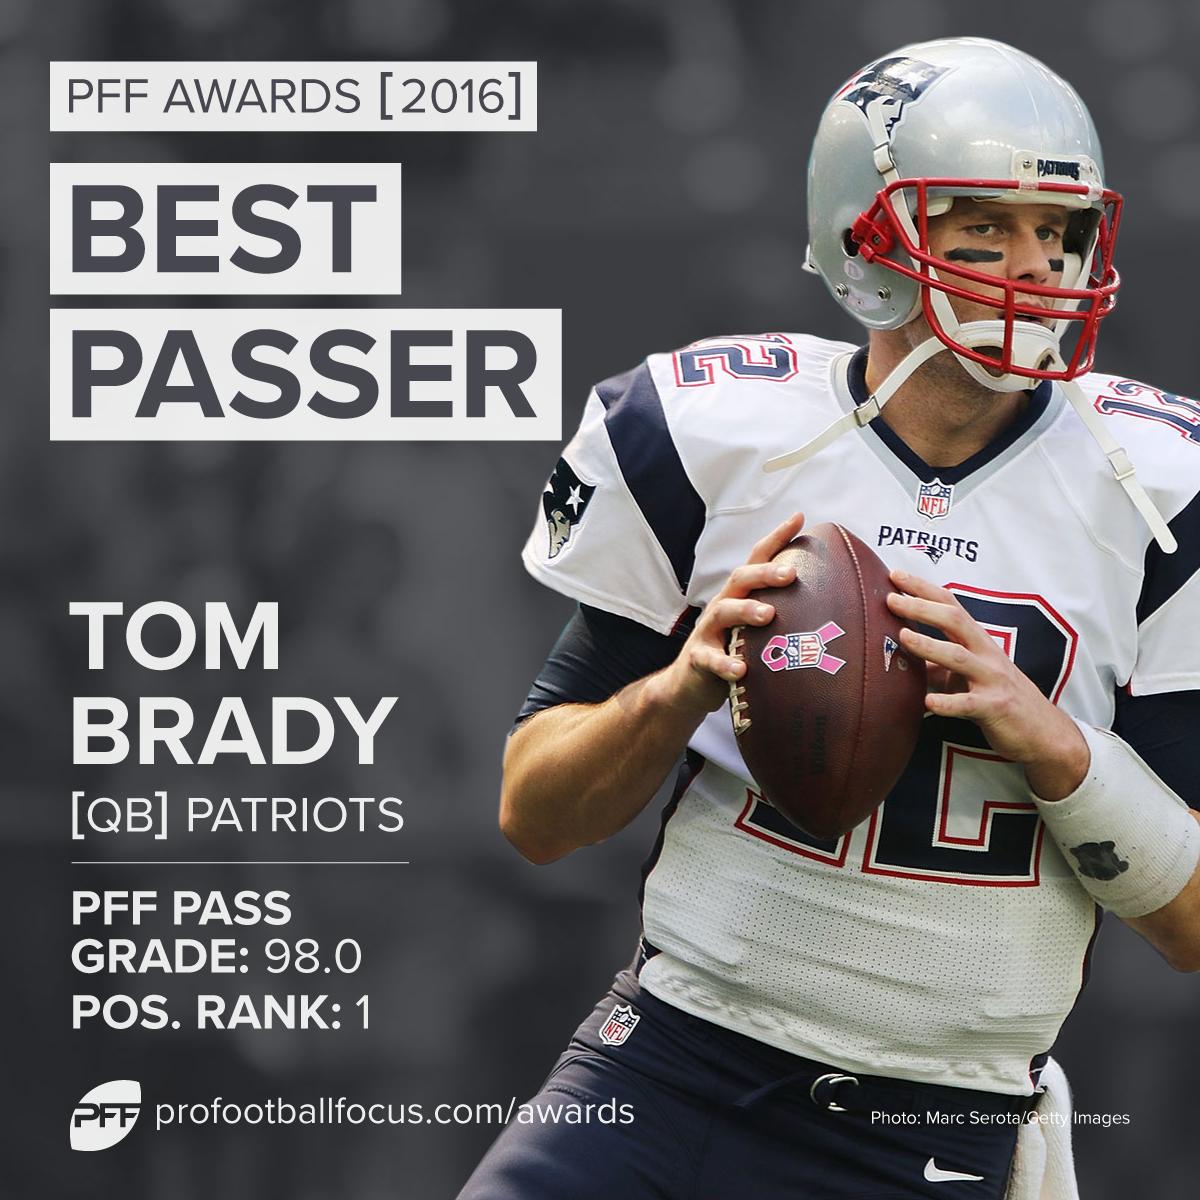 2016 PFF Best Passer: Tom Brady